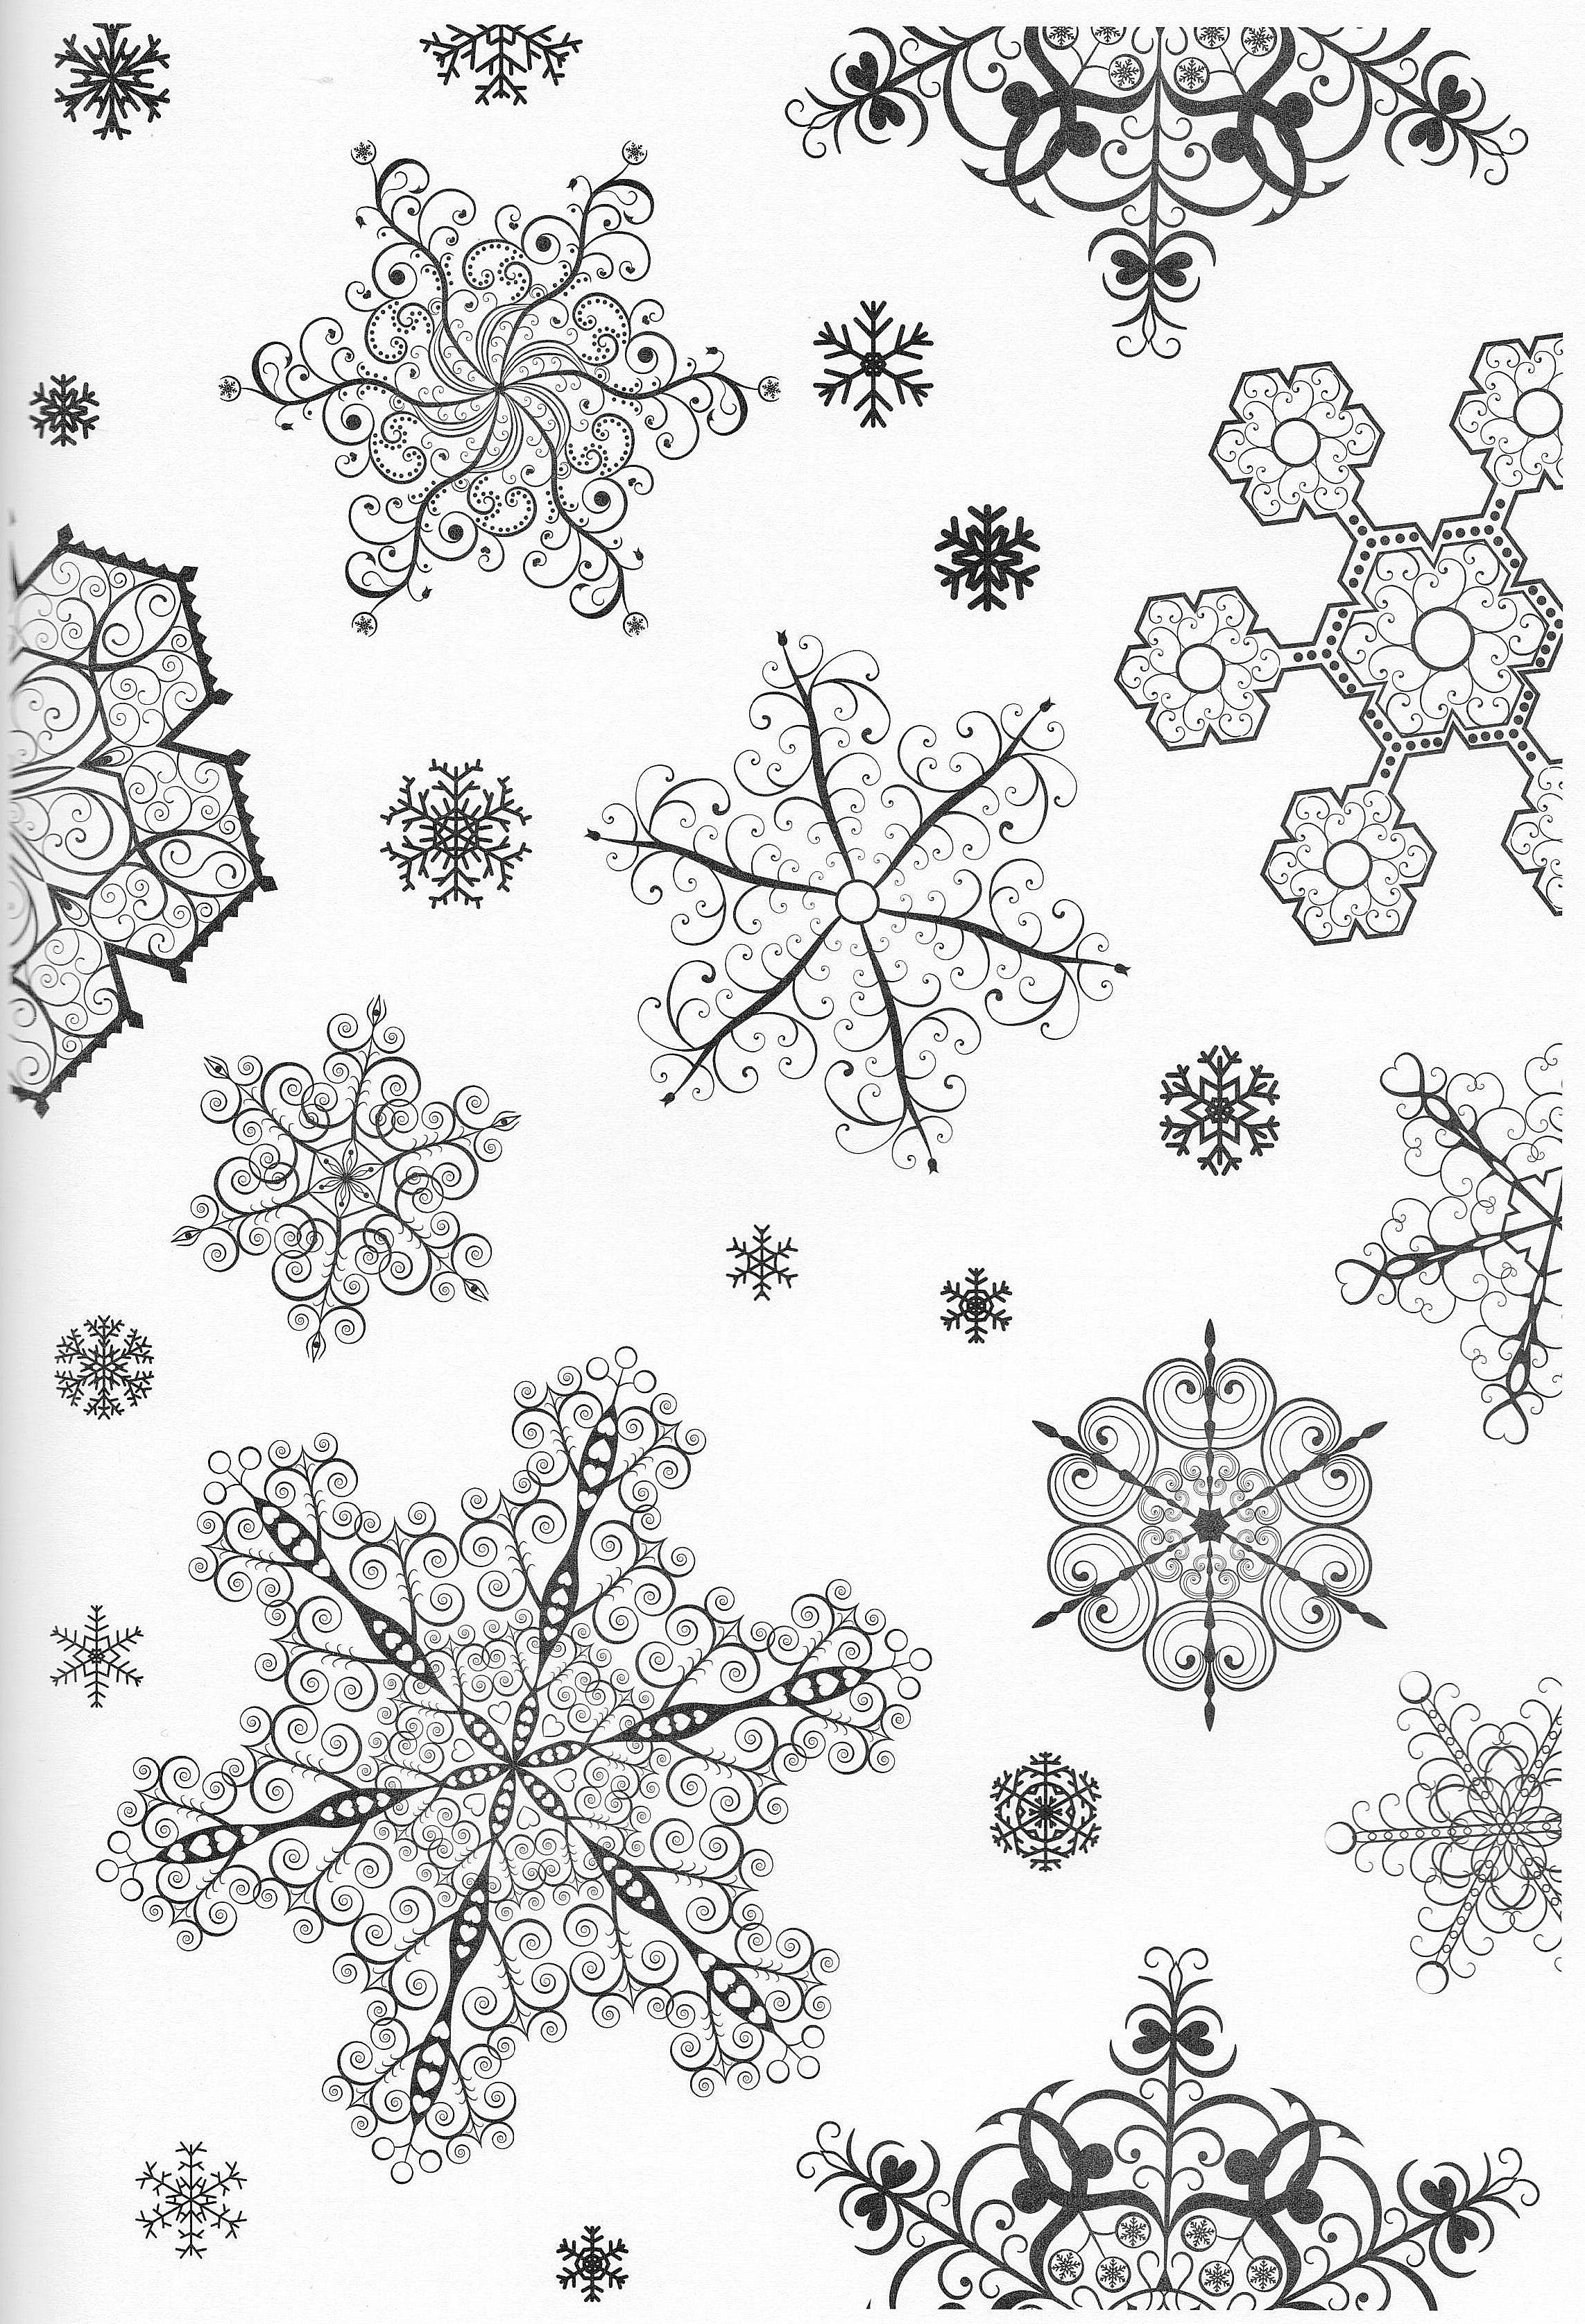 Scandinavian Coloring Book Pg 35 | Color pages, Stencils, Templates ...